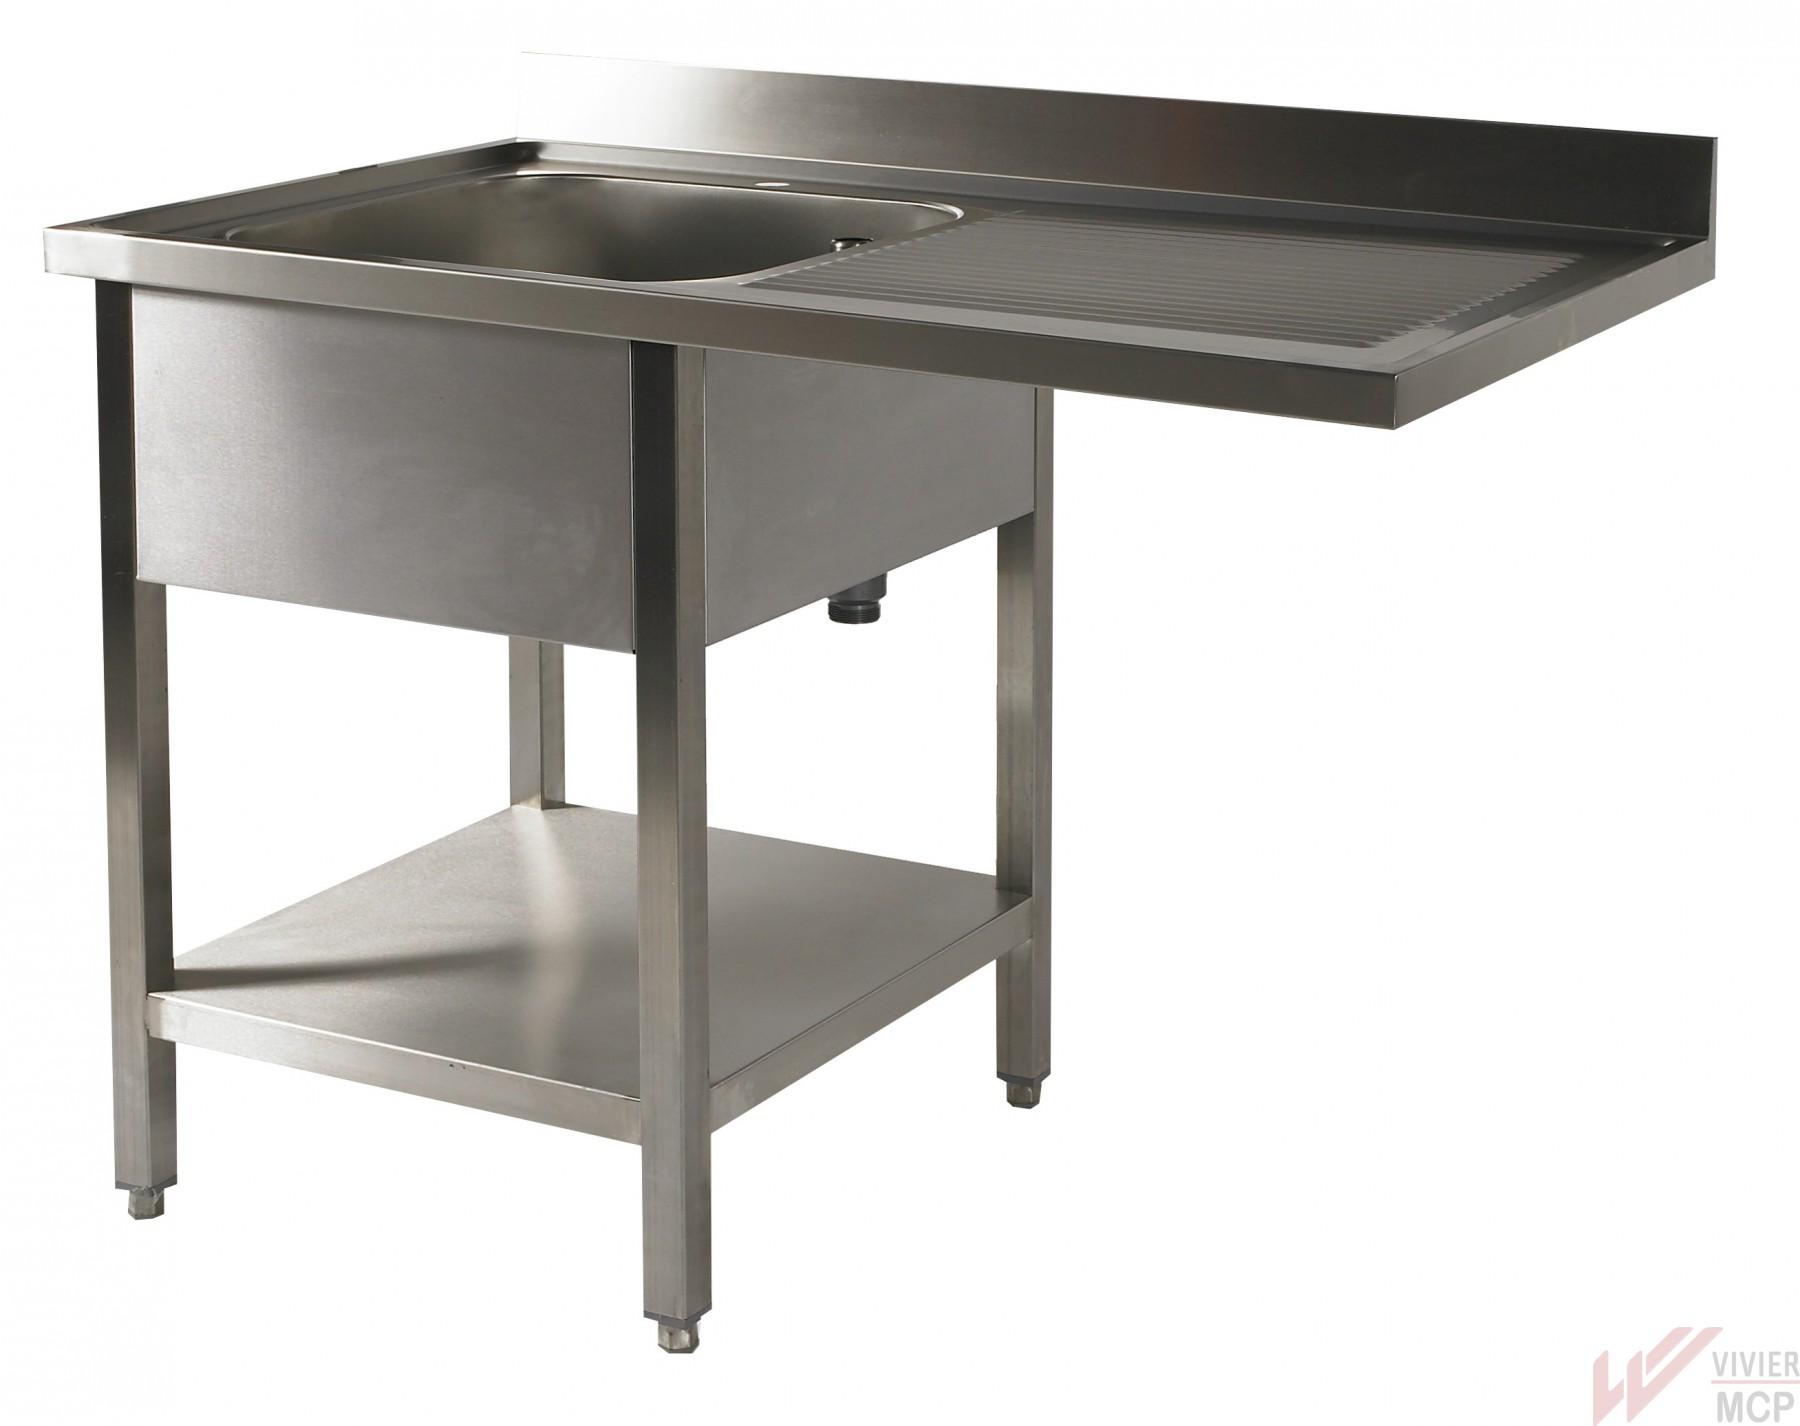 lave vaisselle cuve inox great best encastrable po db. Black Bedroom Furniture Sets. Home Design Ideas